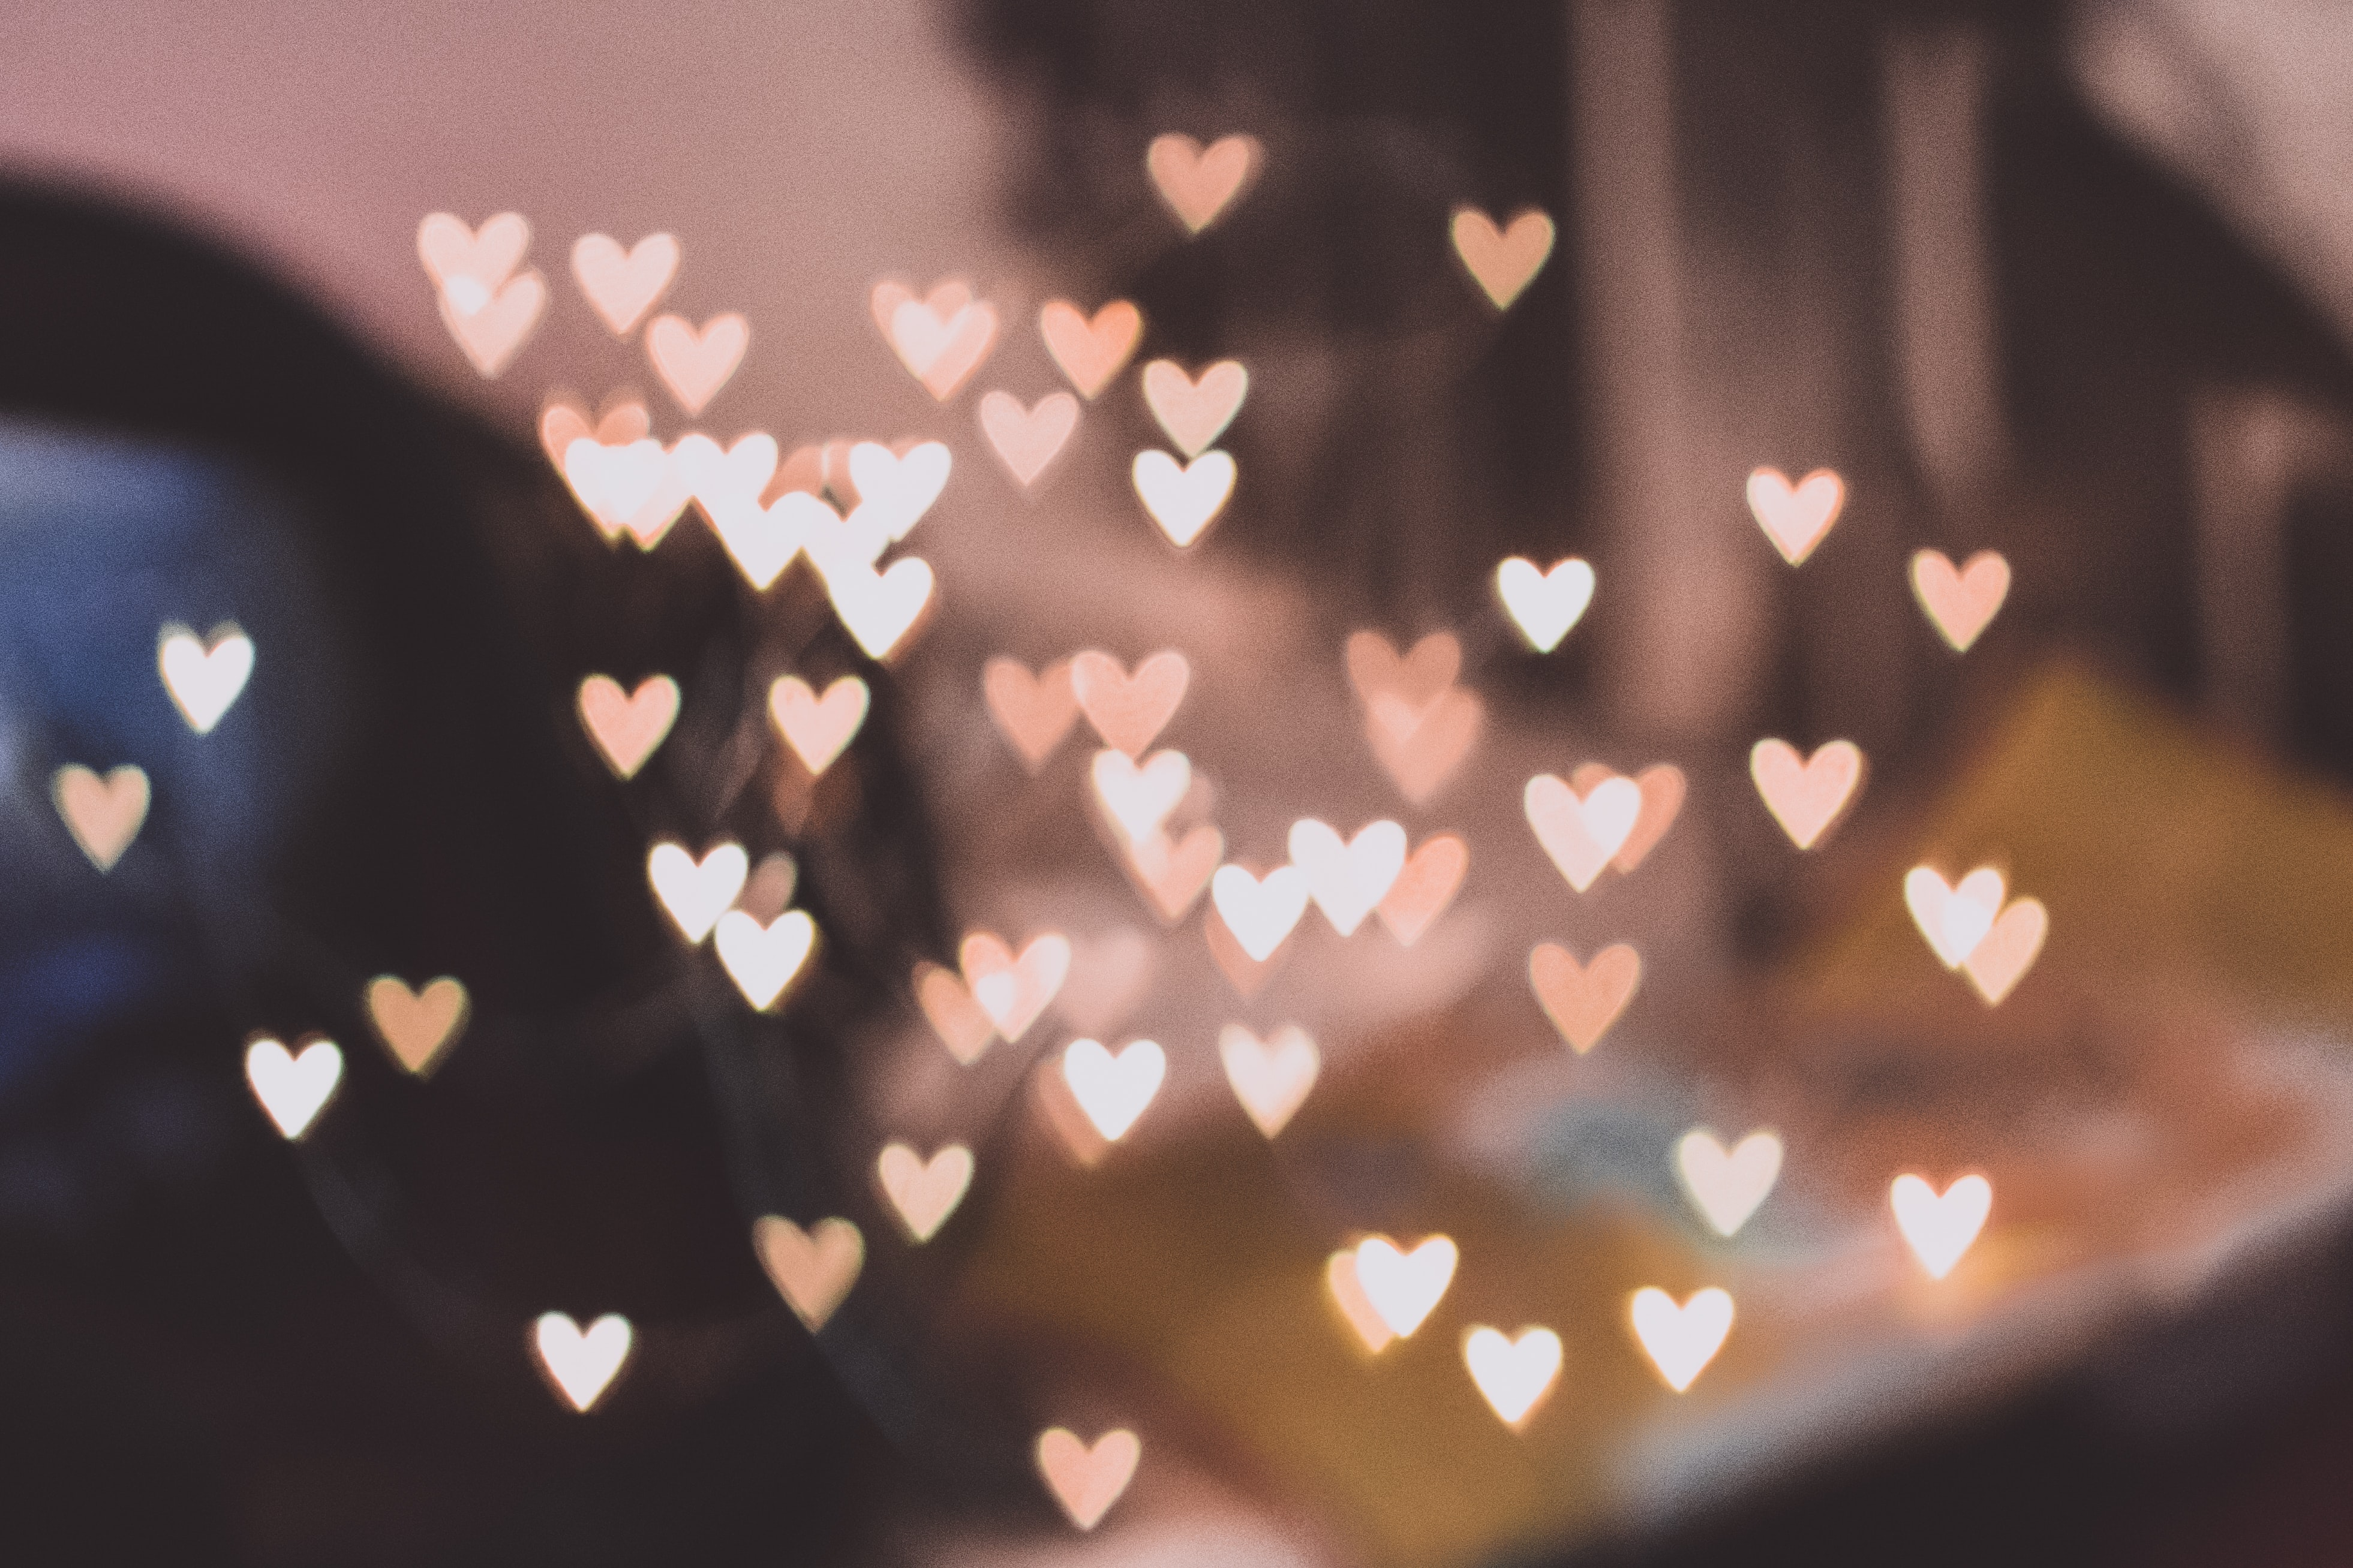 valentines day images, valentines day images for lovers, happy valentines day images, valentines day images for friends, valentines day couple images, valentines day images 2018, images of valentines day, valentines day images for husband, valentines day images gif, cute valentines day images, valentines day images for wife, images valentines day, valentines day wishes images, best valentines day images, romantic valentines day images, happy valentines day friends images, advance valentines day wishes images, valentines day gif images, valentines day funny images, valentines day hd images, happy valentines day funny images, valentines day pictures images photos, valentines day images free download, valentines day quotes images, happy valentines day hd images, happy valentines day images for friends, romantic images of valentines day, valentines day quotes with images, valentines+day+images, images for valentines day, valentines day images in tamil, valentines day special images, valentines day images download, valentines day images hd, latest valentines day images, valentines day images free, happy valentines day my love images, happy valentines day gif images, valentines day images and quotes, valentines day images for singles, valentines day images 2016, valentines day images in telugu, images of happy valentines day, valentines day images for whatsapp, happy valentines day images for husband, images of valentines day hearts, valentines day card images, valentines day images with quotes, happy valentines day couple images, happy valentines day husband images